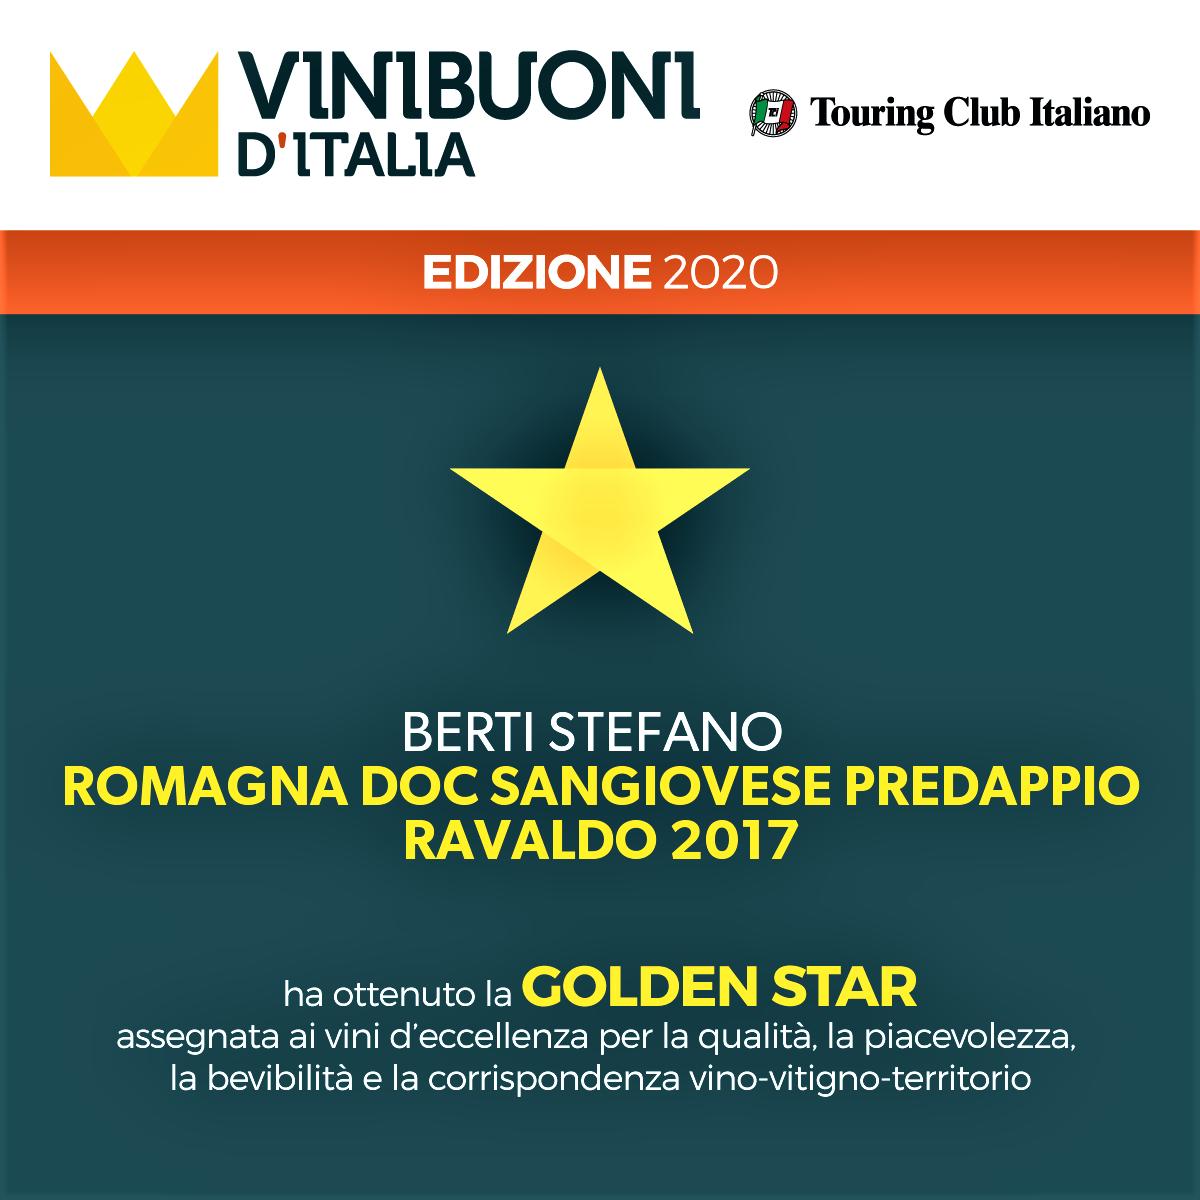 golden-star-vinibuoni-1582